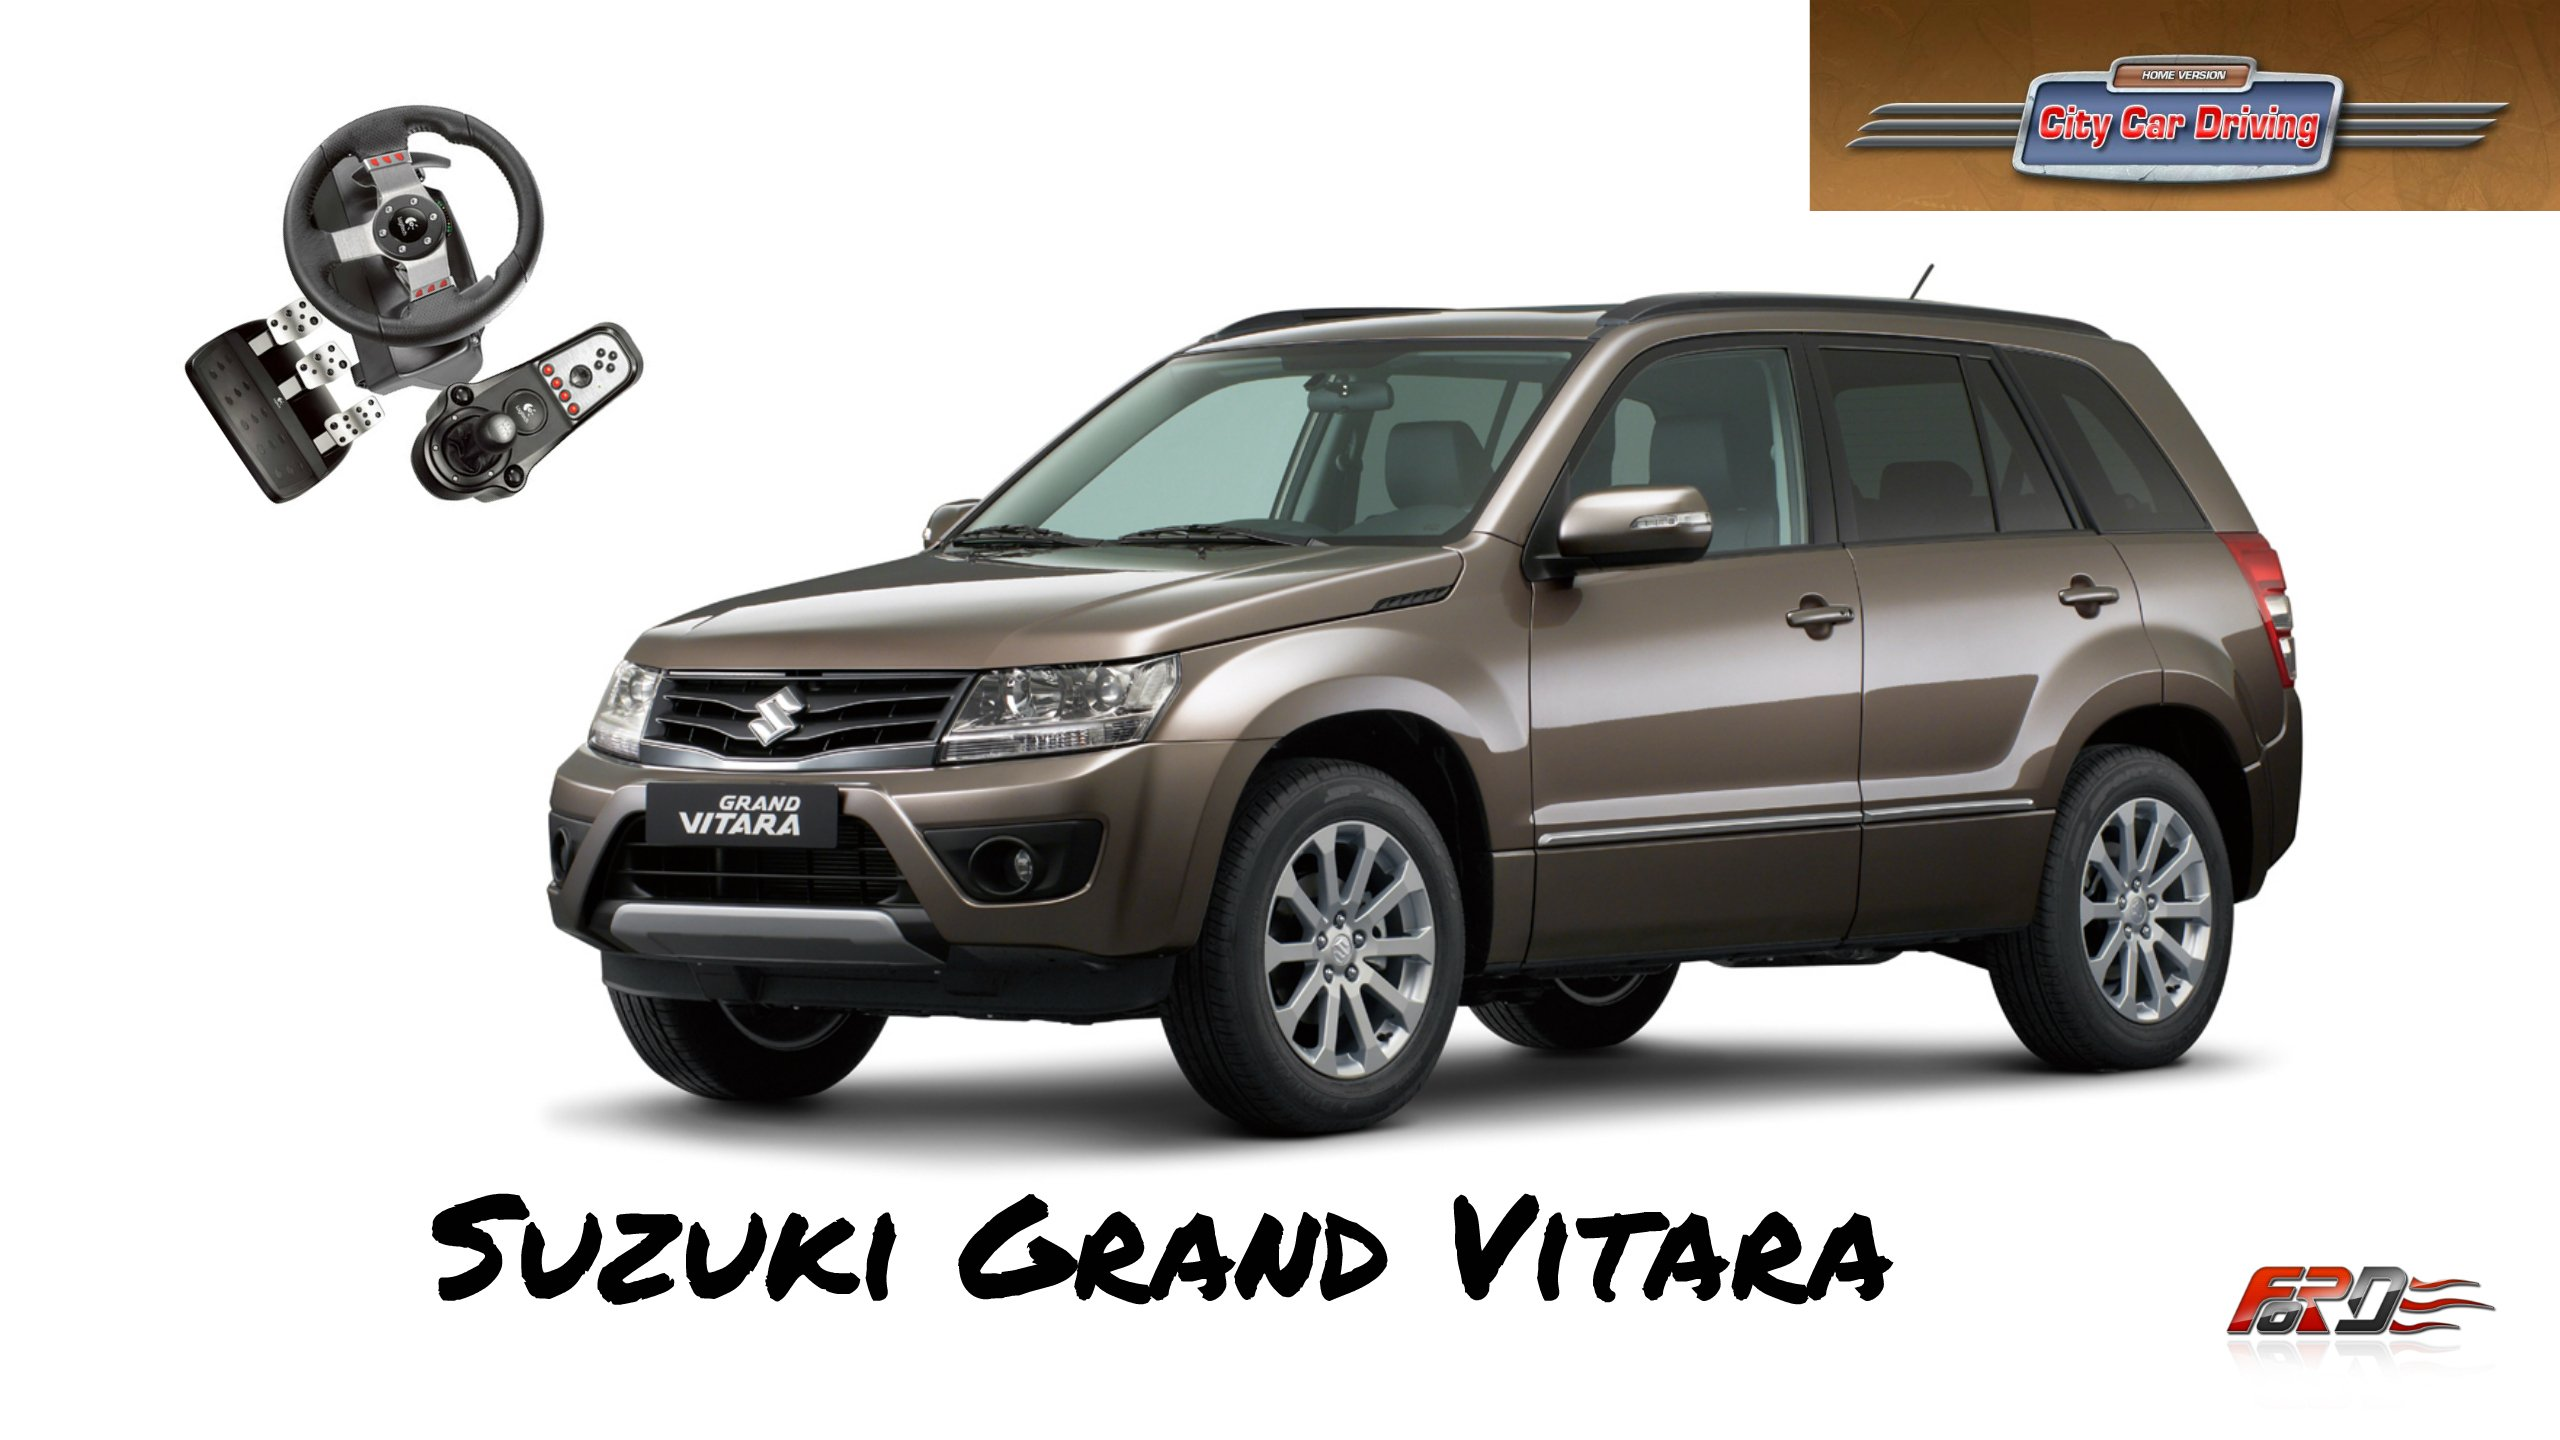 Suzuki Grand Vitara - тест-драйв, обзор японского паркетника на бездорожье в City Car Driving 1.5 - Изображение 1